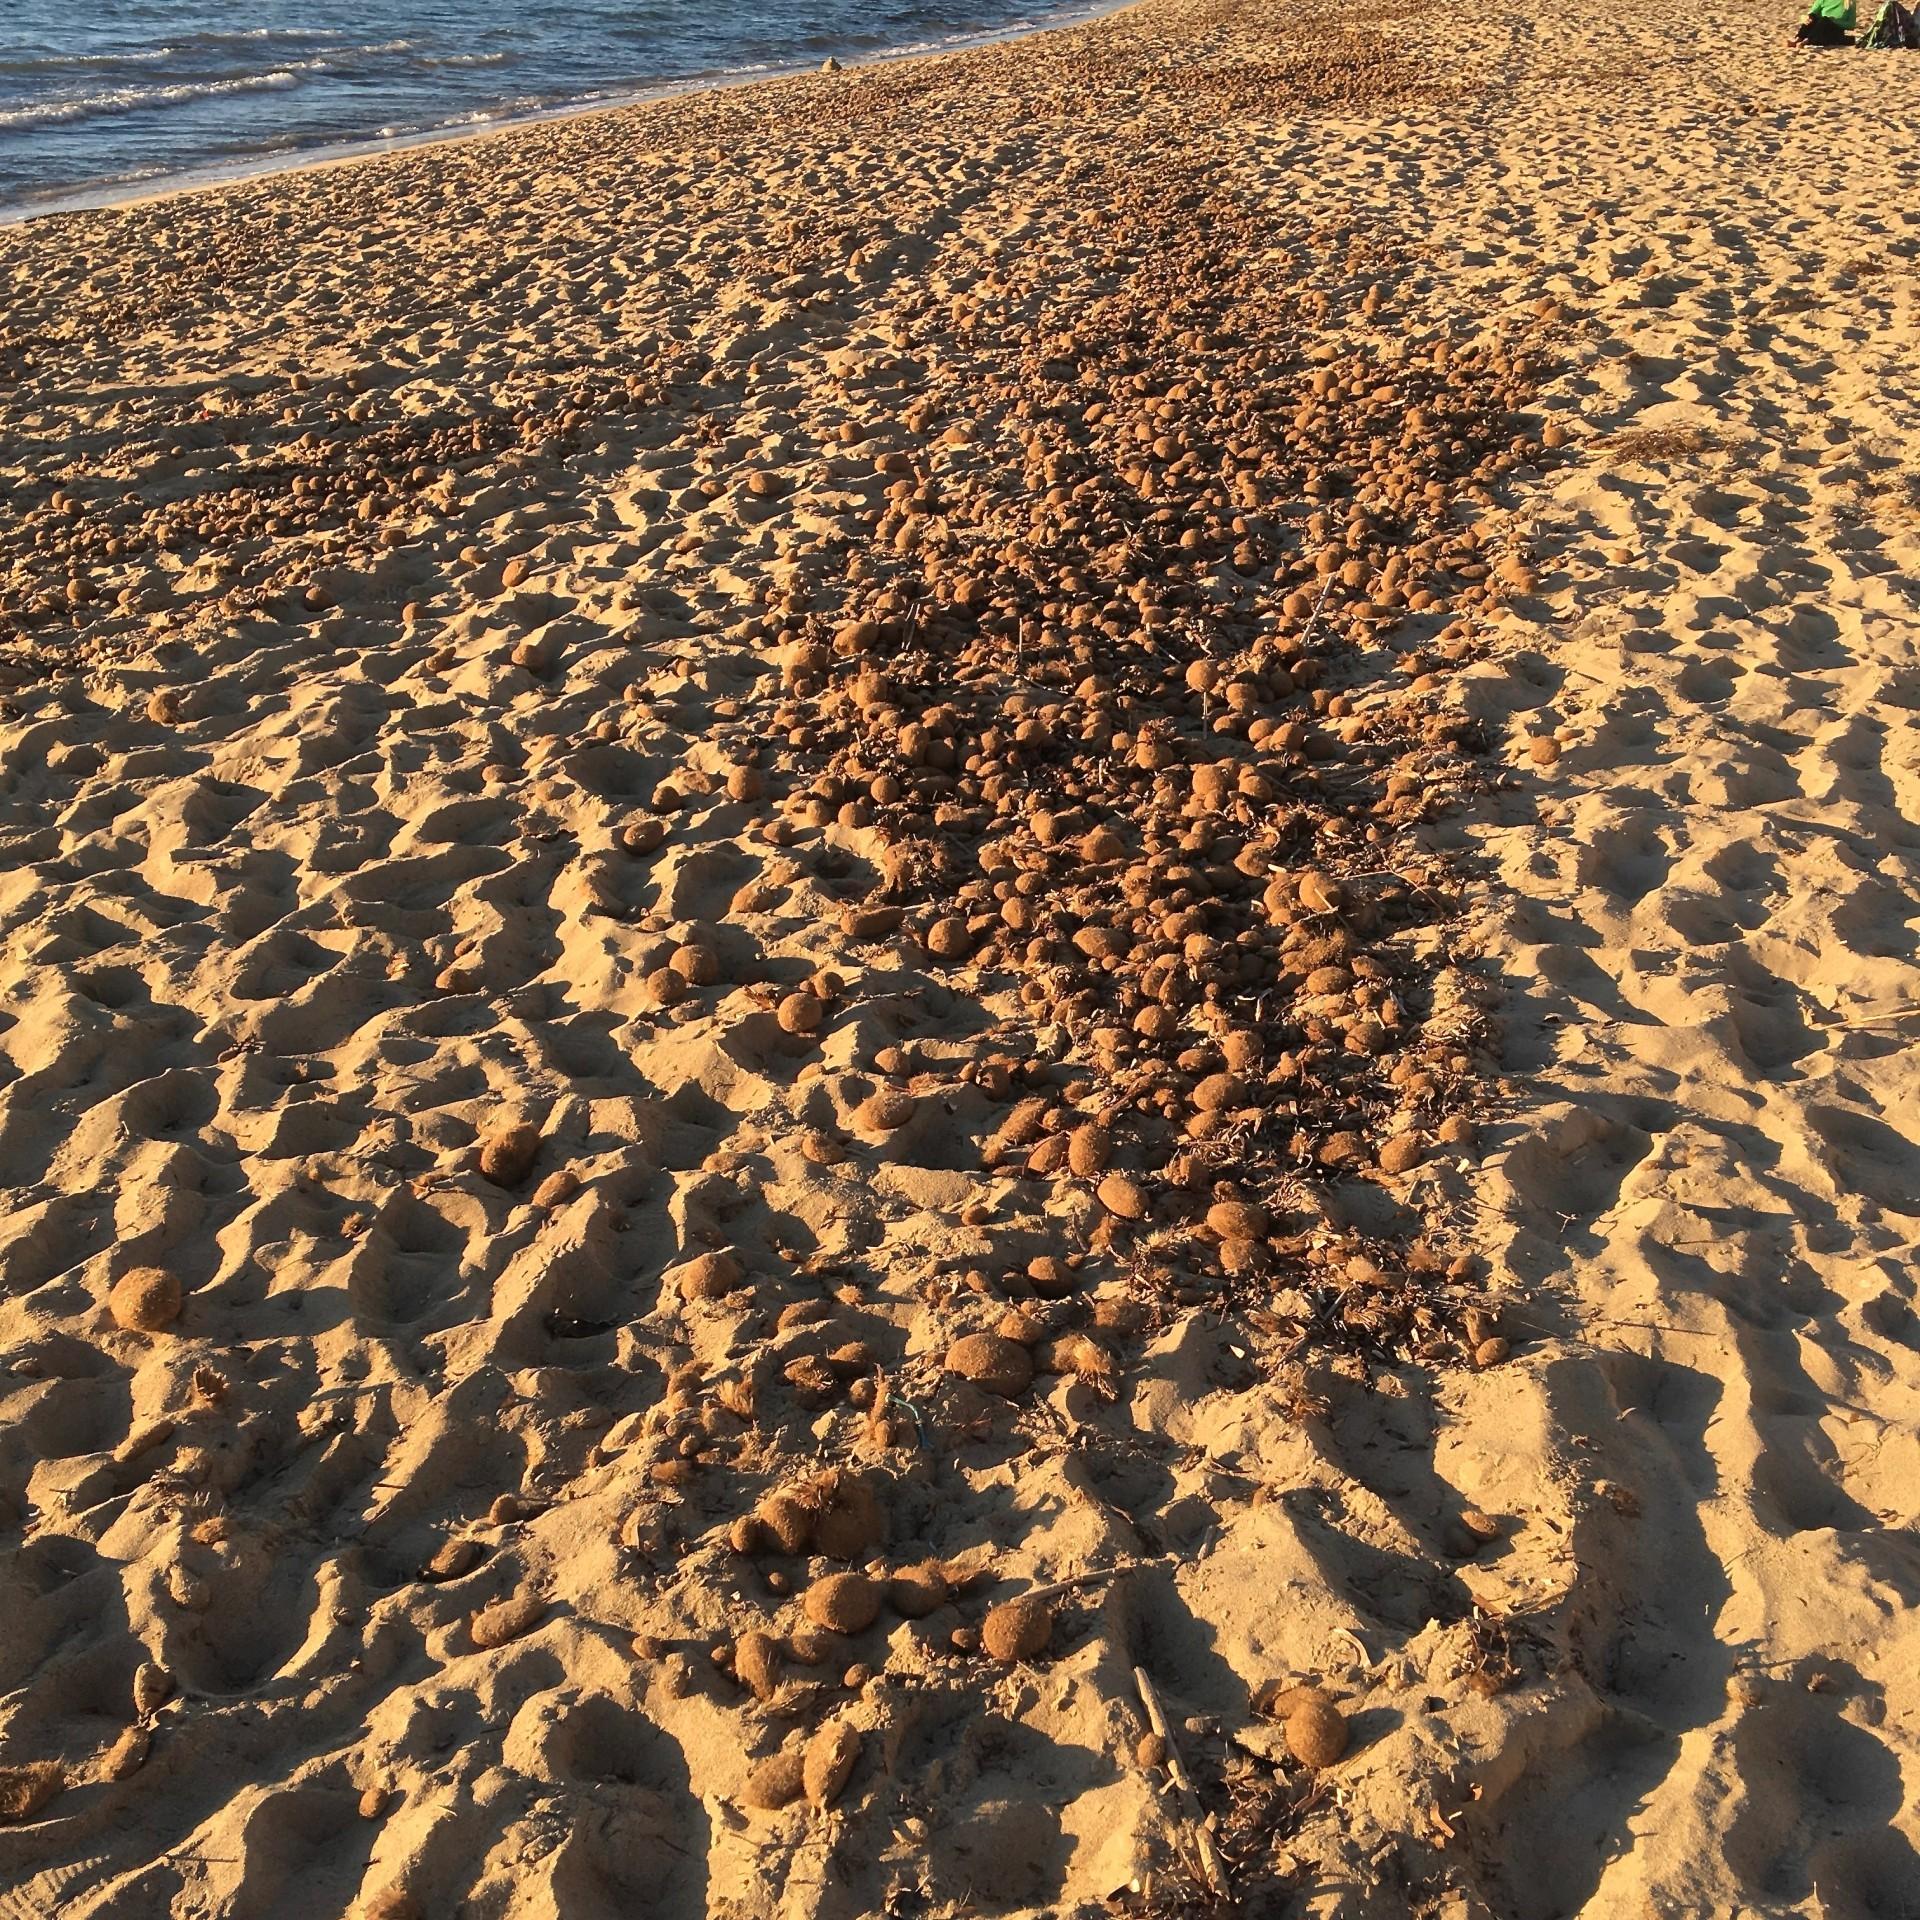 Viele Seekugeln lagen am Strand in Palma